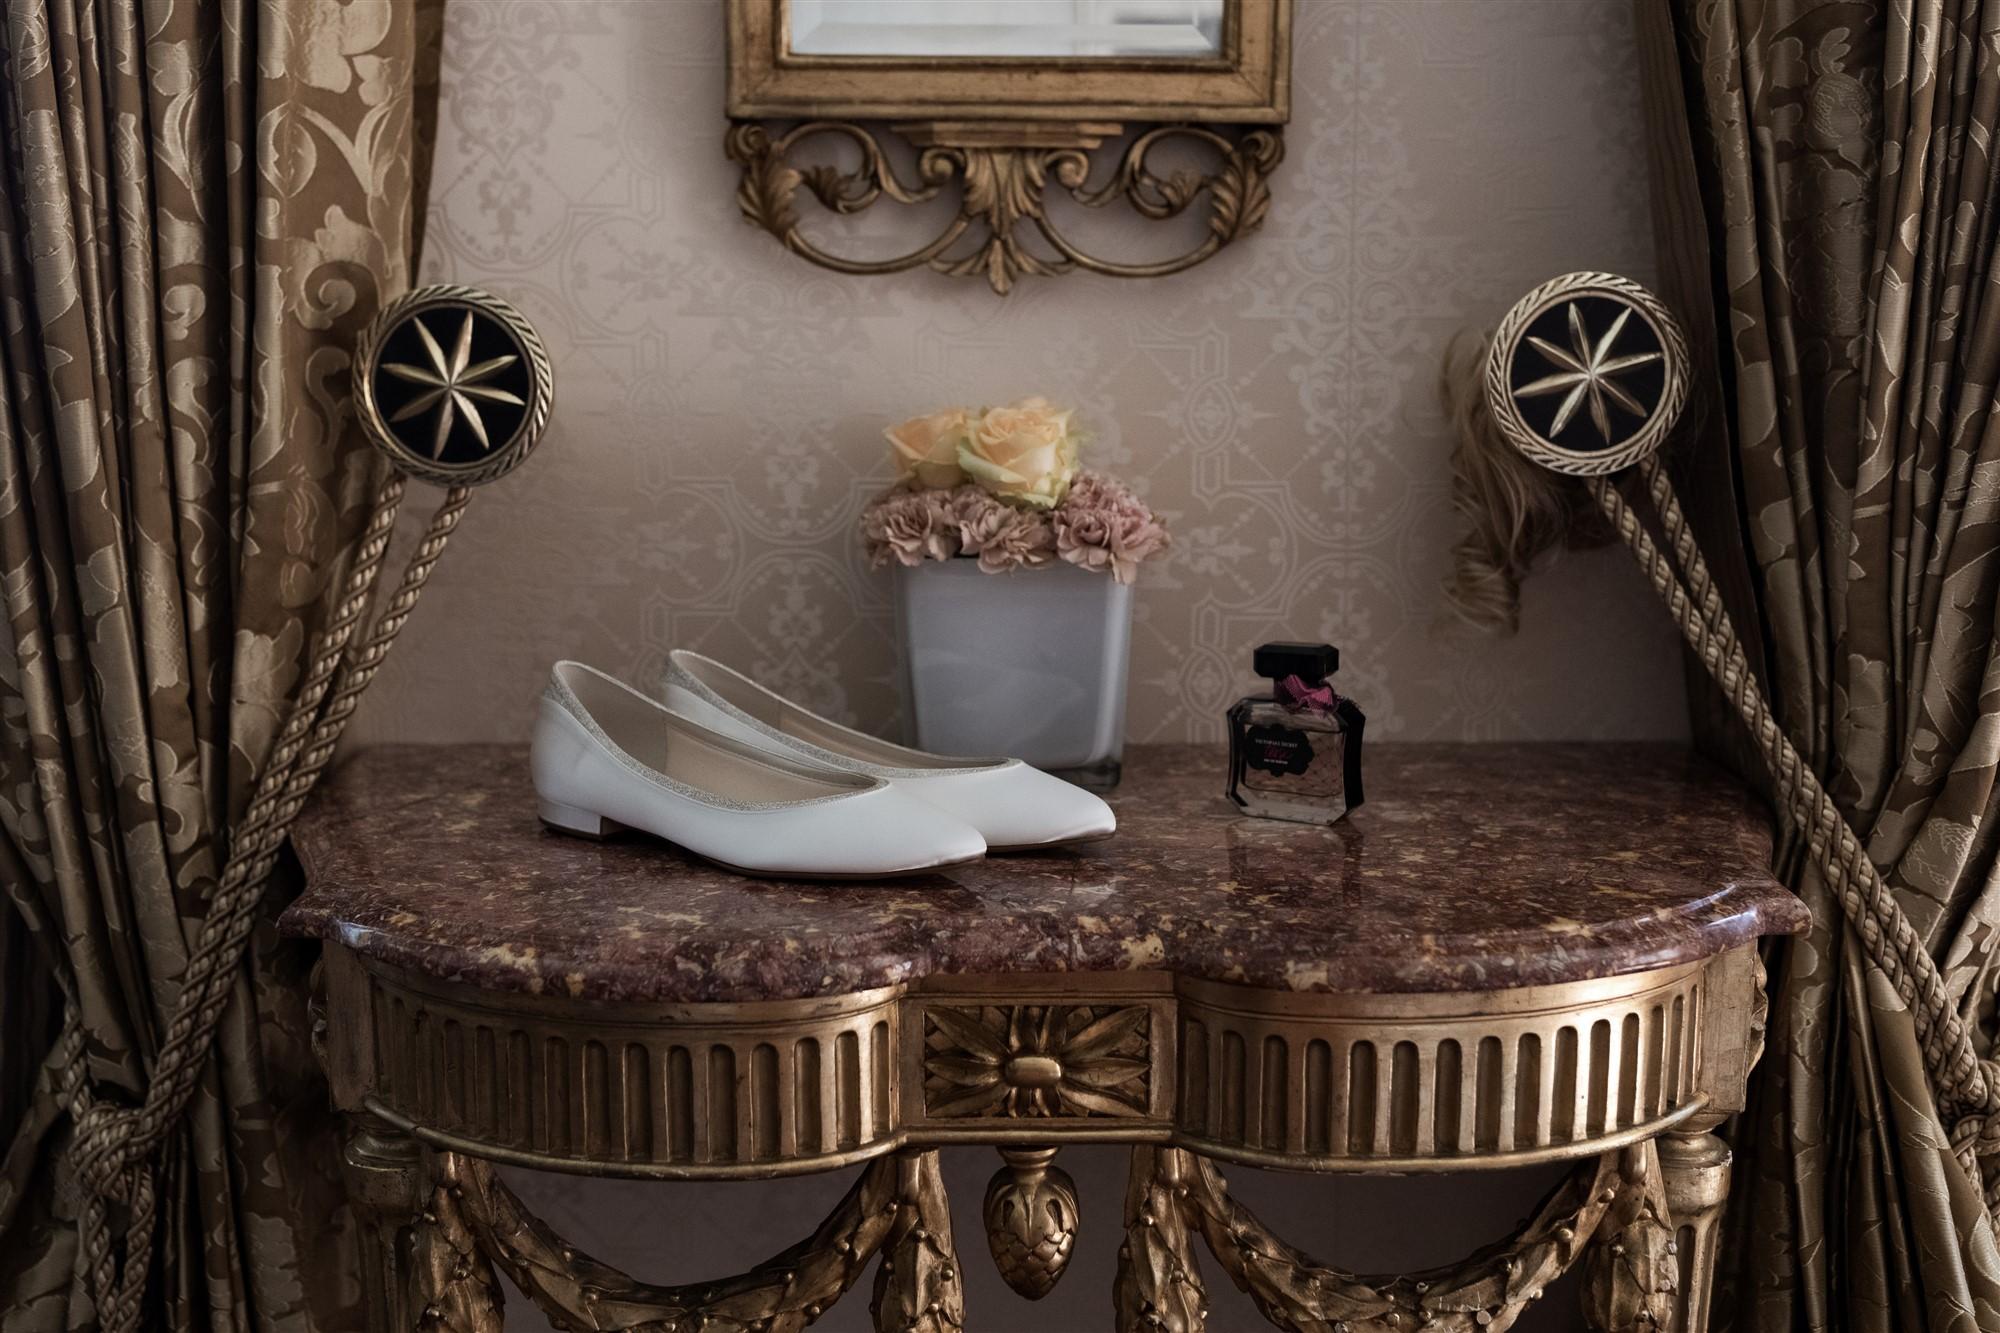 Hochzeitsfotograf Basel Hochzeit Grand Hotel Les Trois Rois Basel - Details